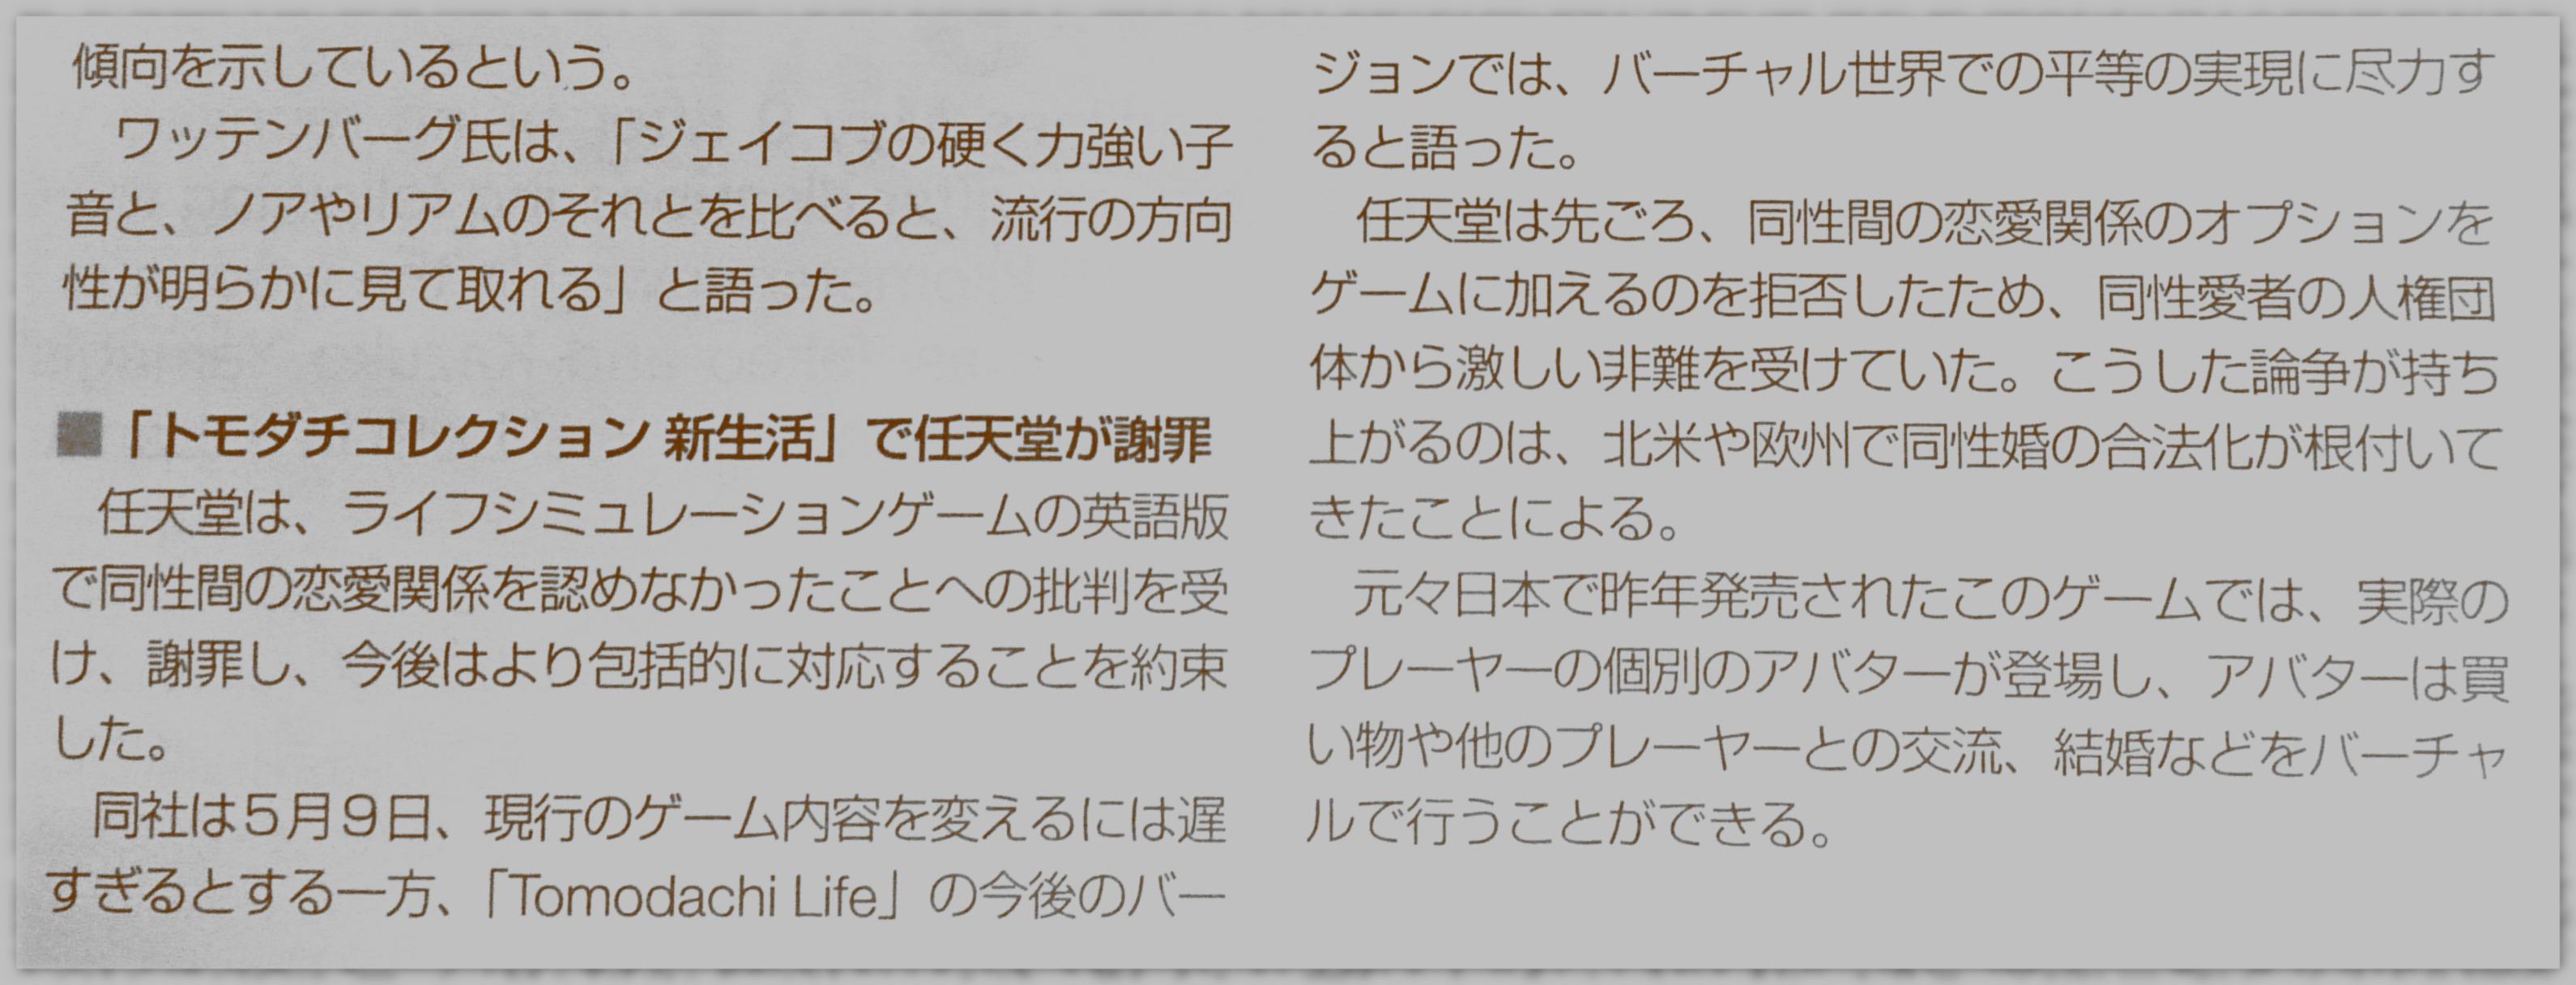 From Asahi Weekly